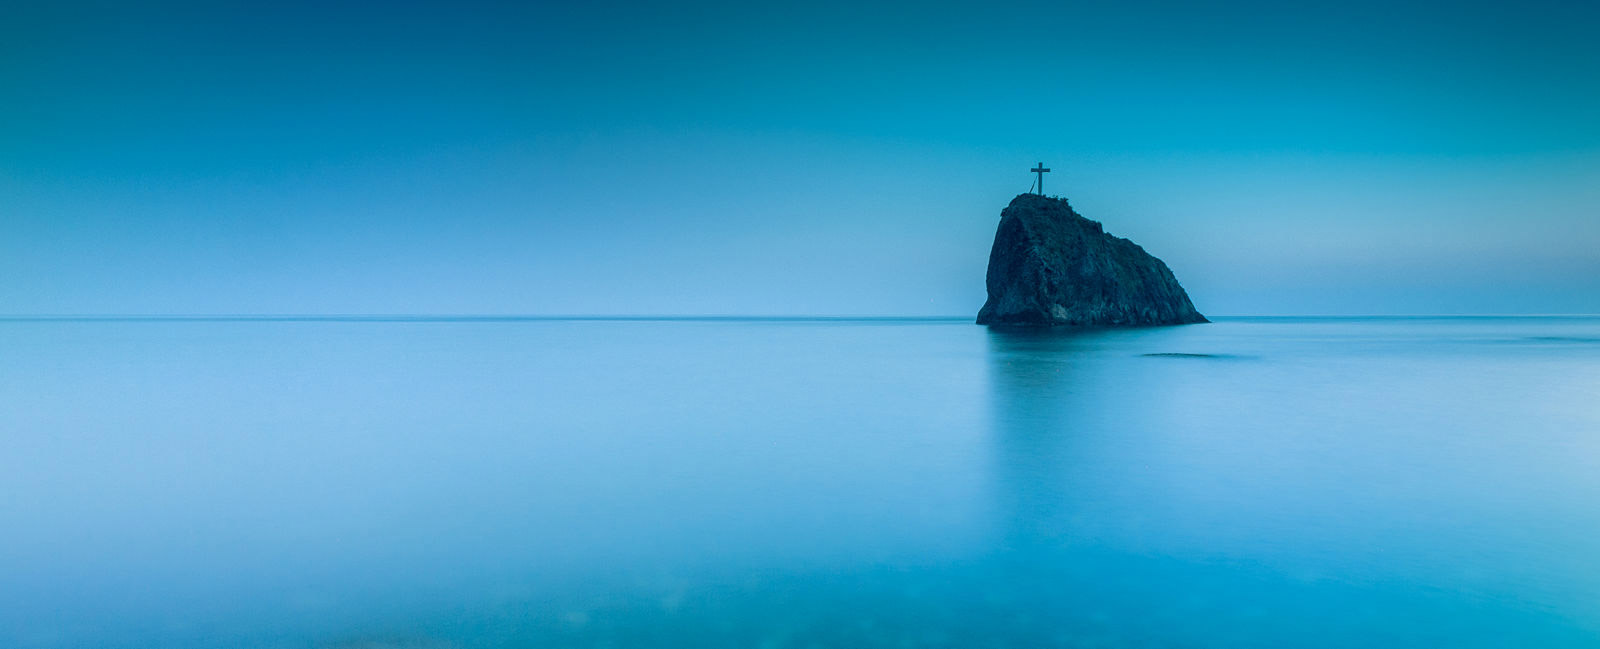 "Rock of the Holy Appearance, Fiolent, Sevastopol, © Yuri Pritysk, 1 place, ""Russian Civilization"" International Photo Contest"